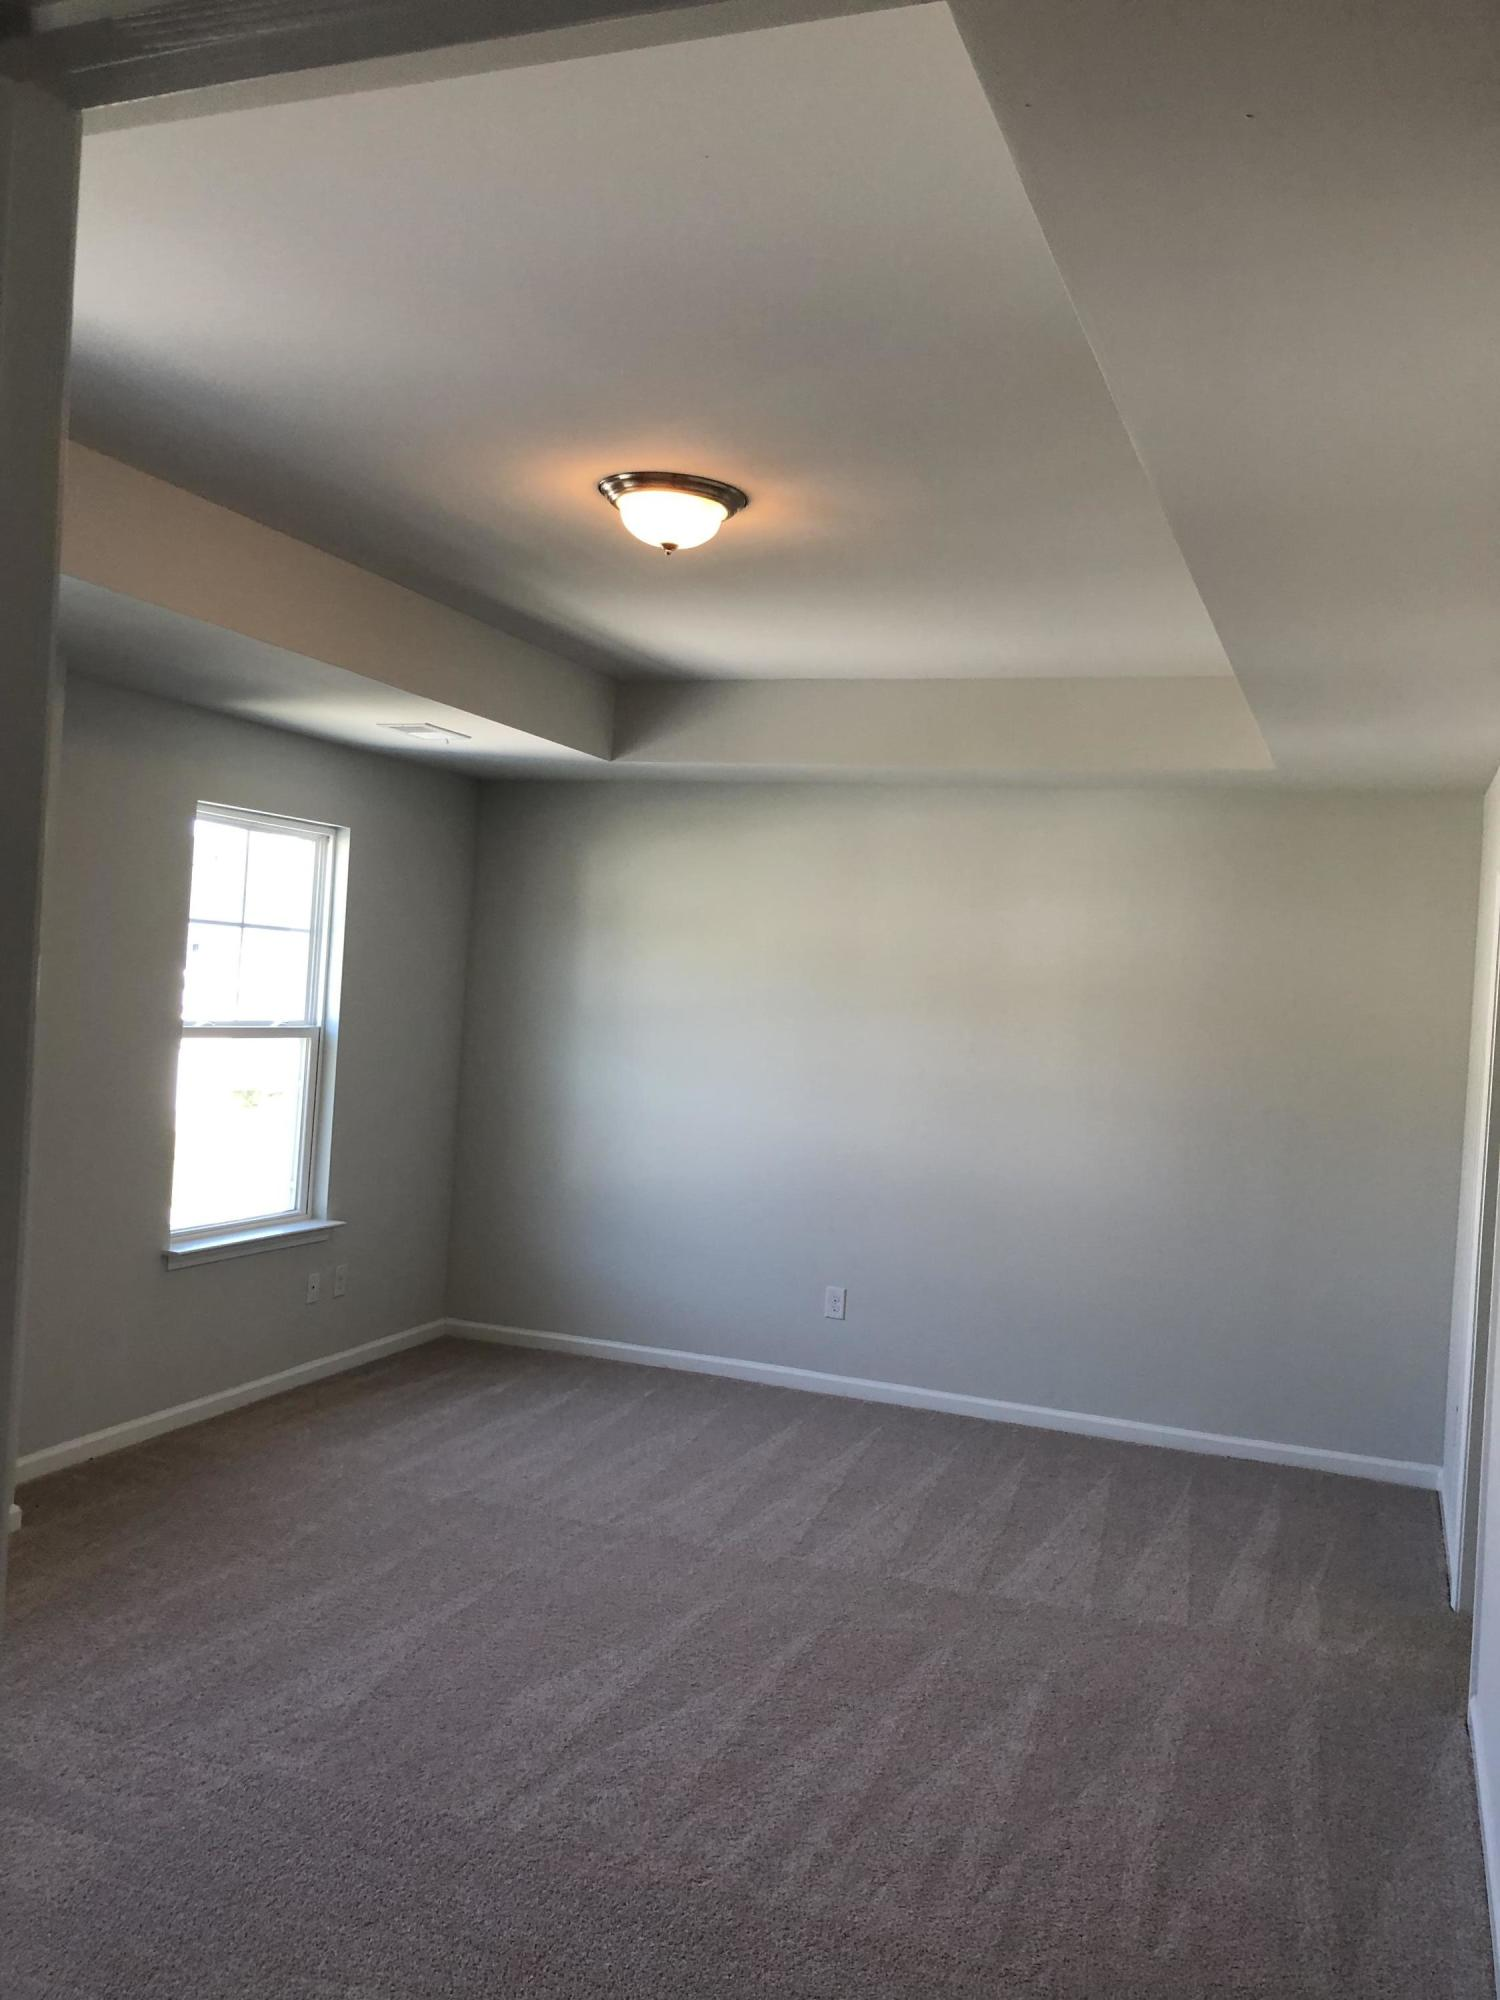 Cane Bay Plantation Homes For Sale - 454 Zenith, Summerville, SC - 6